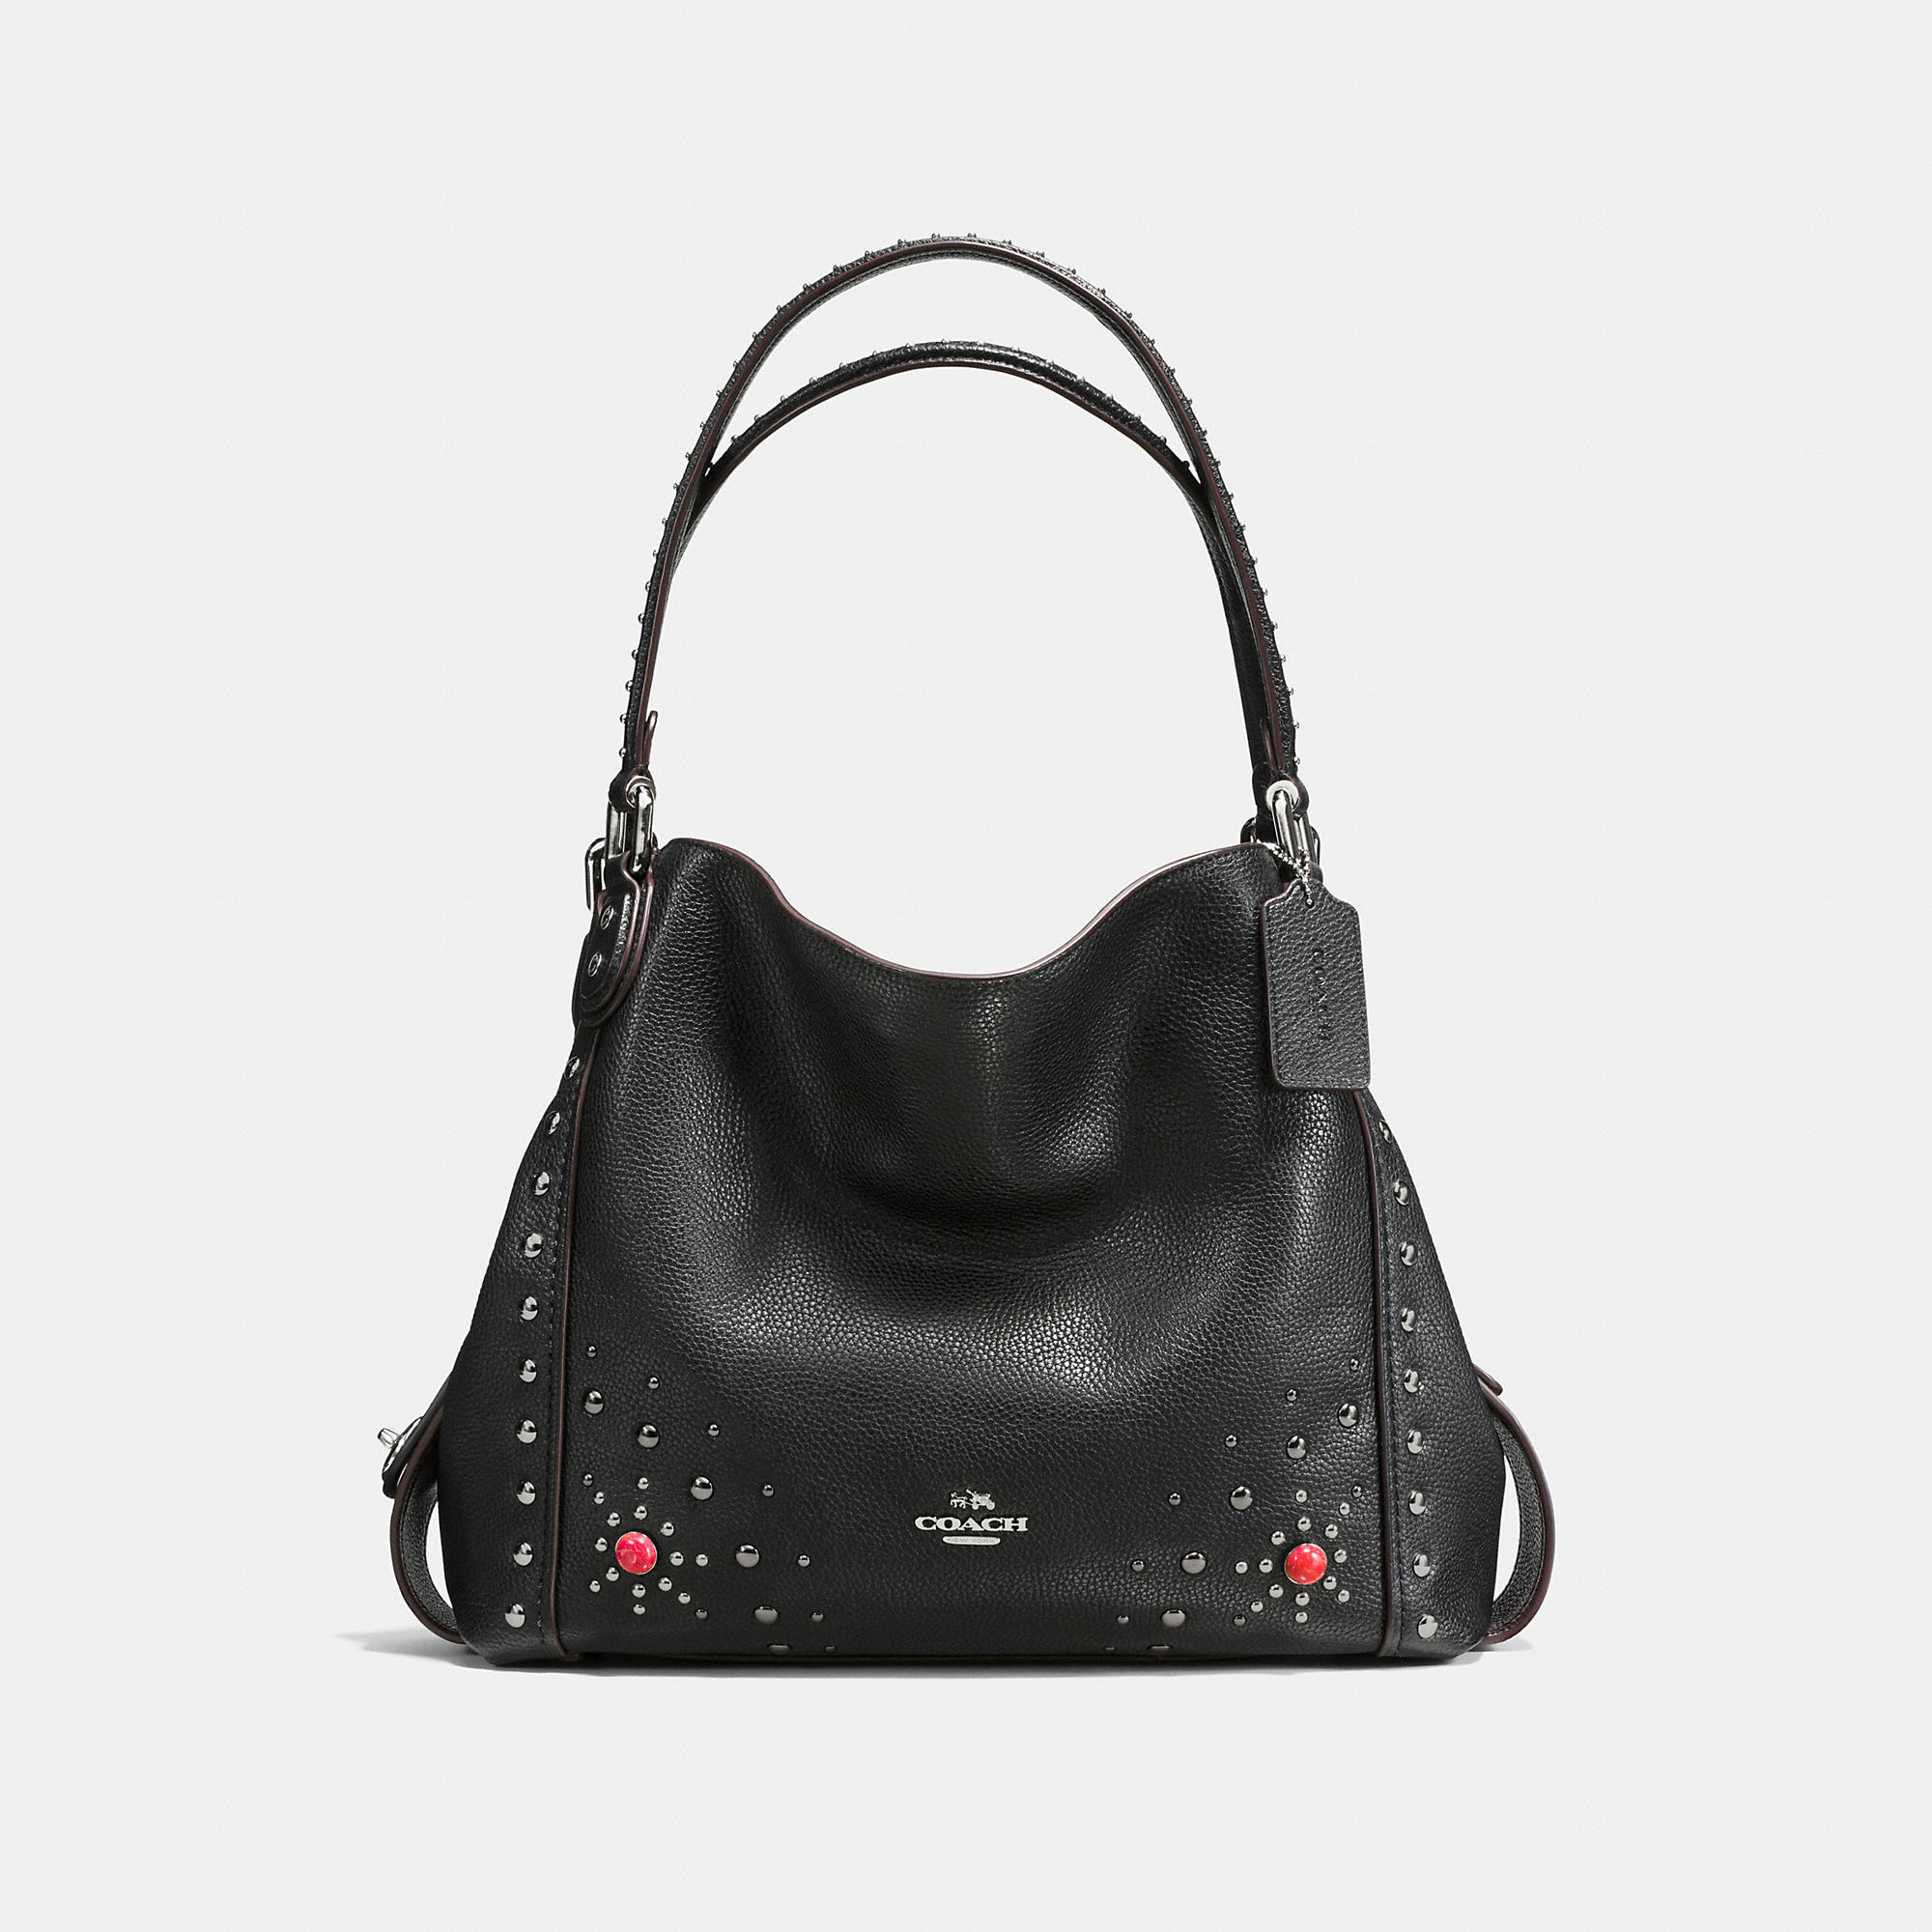 Coach Western Rivets Edie Shoulder Bag 31 In Polished Pebble Leather